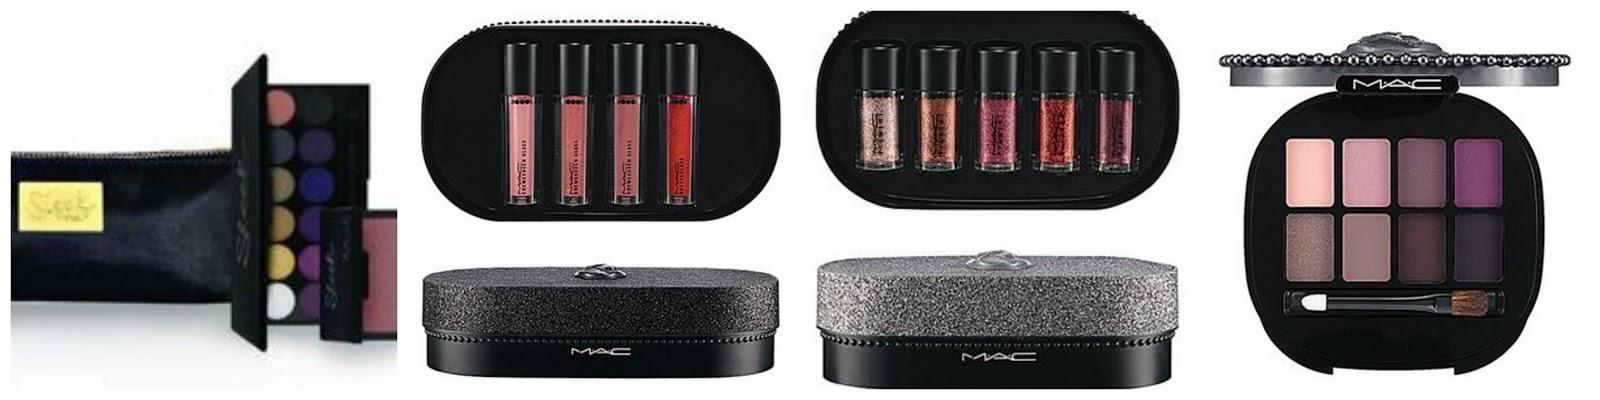 MAC Gift Sets